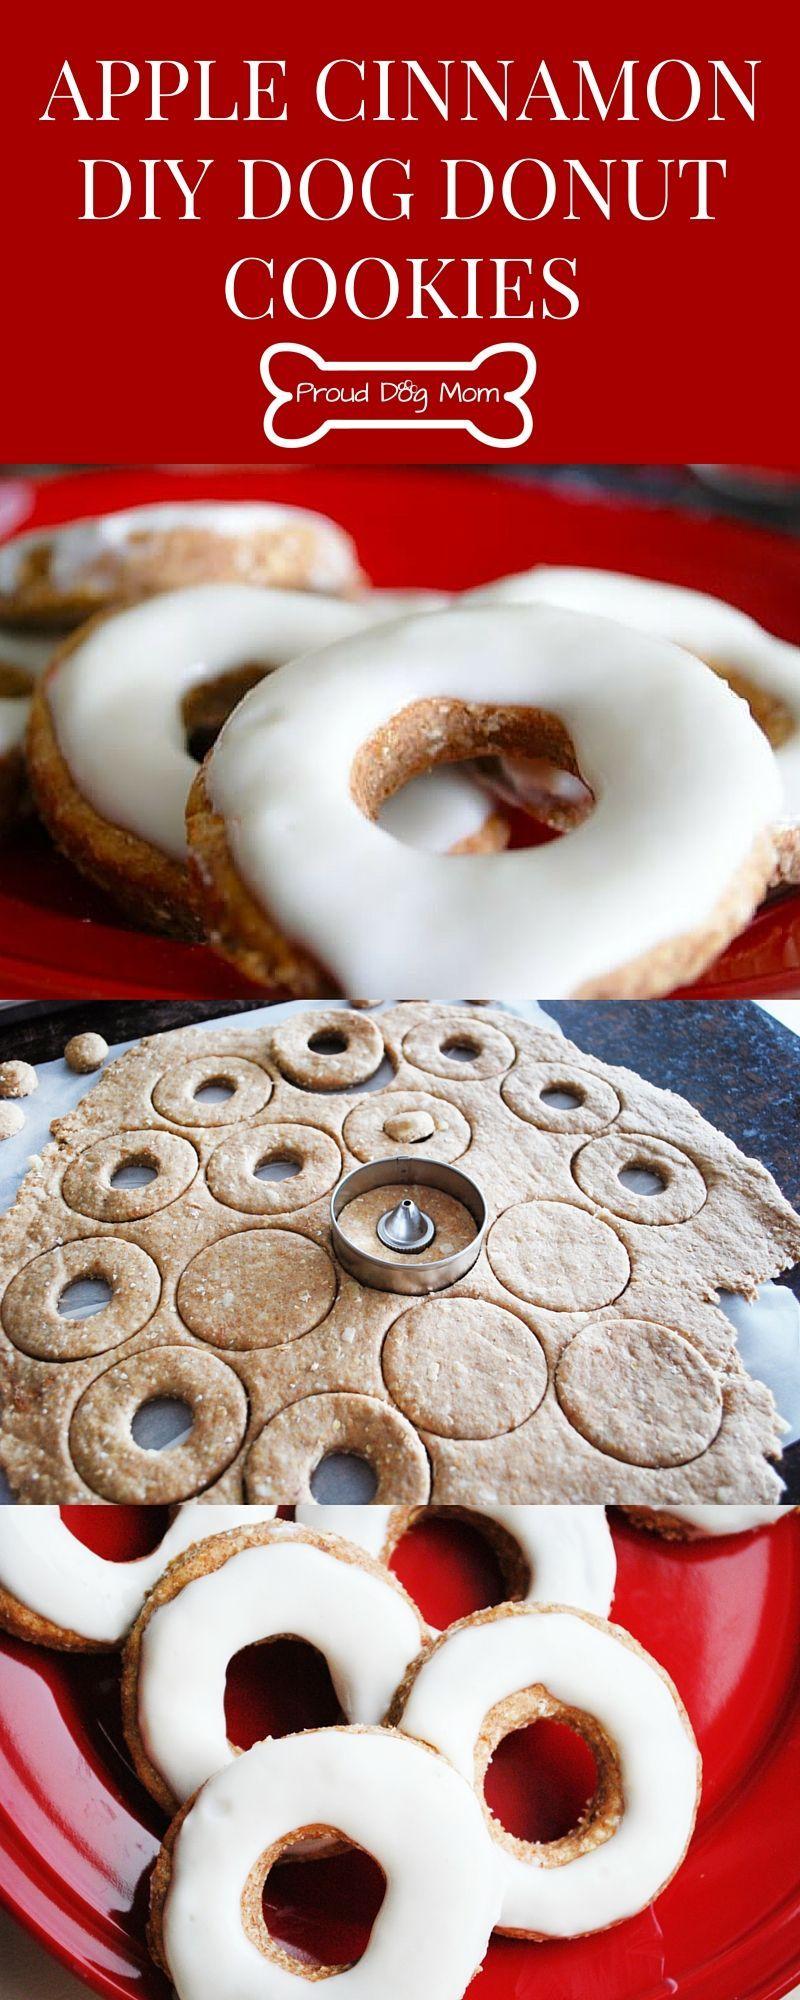 Apple Cinnamon DIY Dog Donut Cookies Recipe Homemade